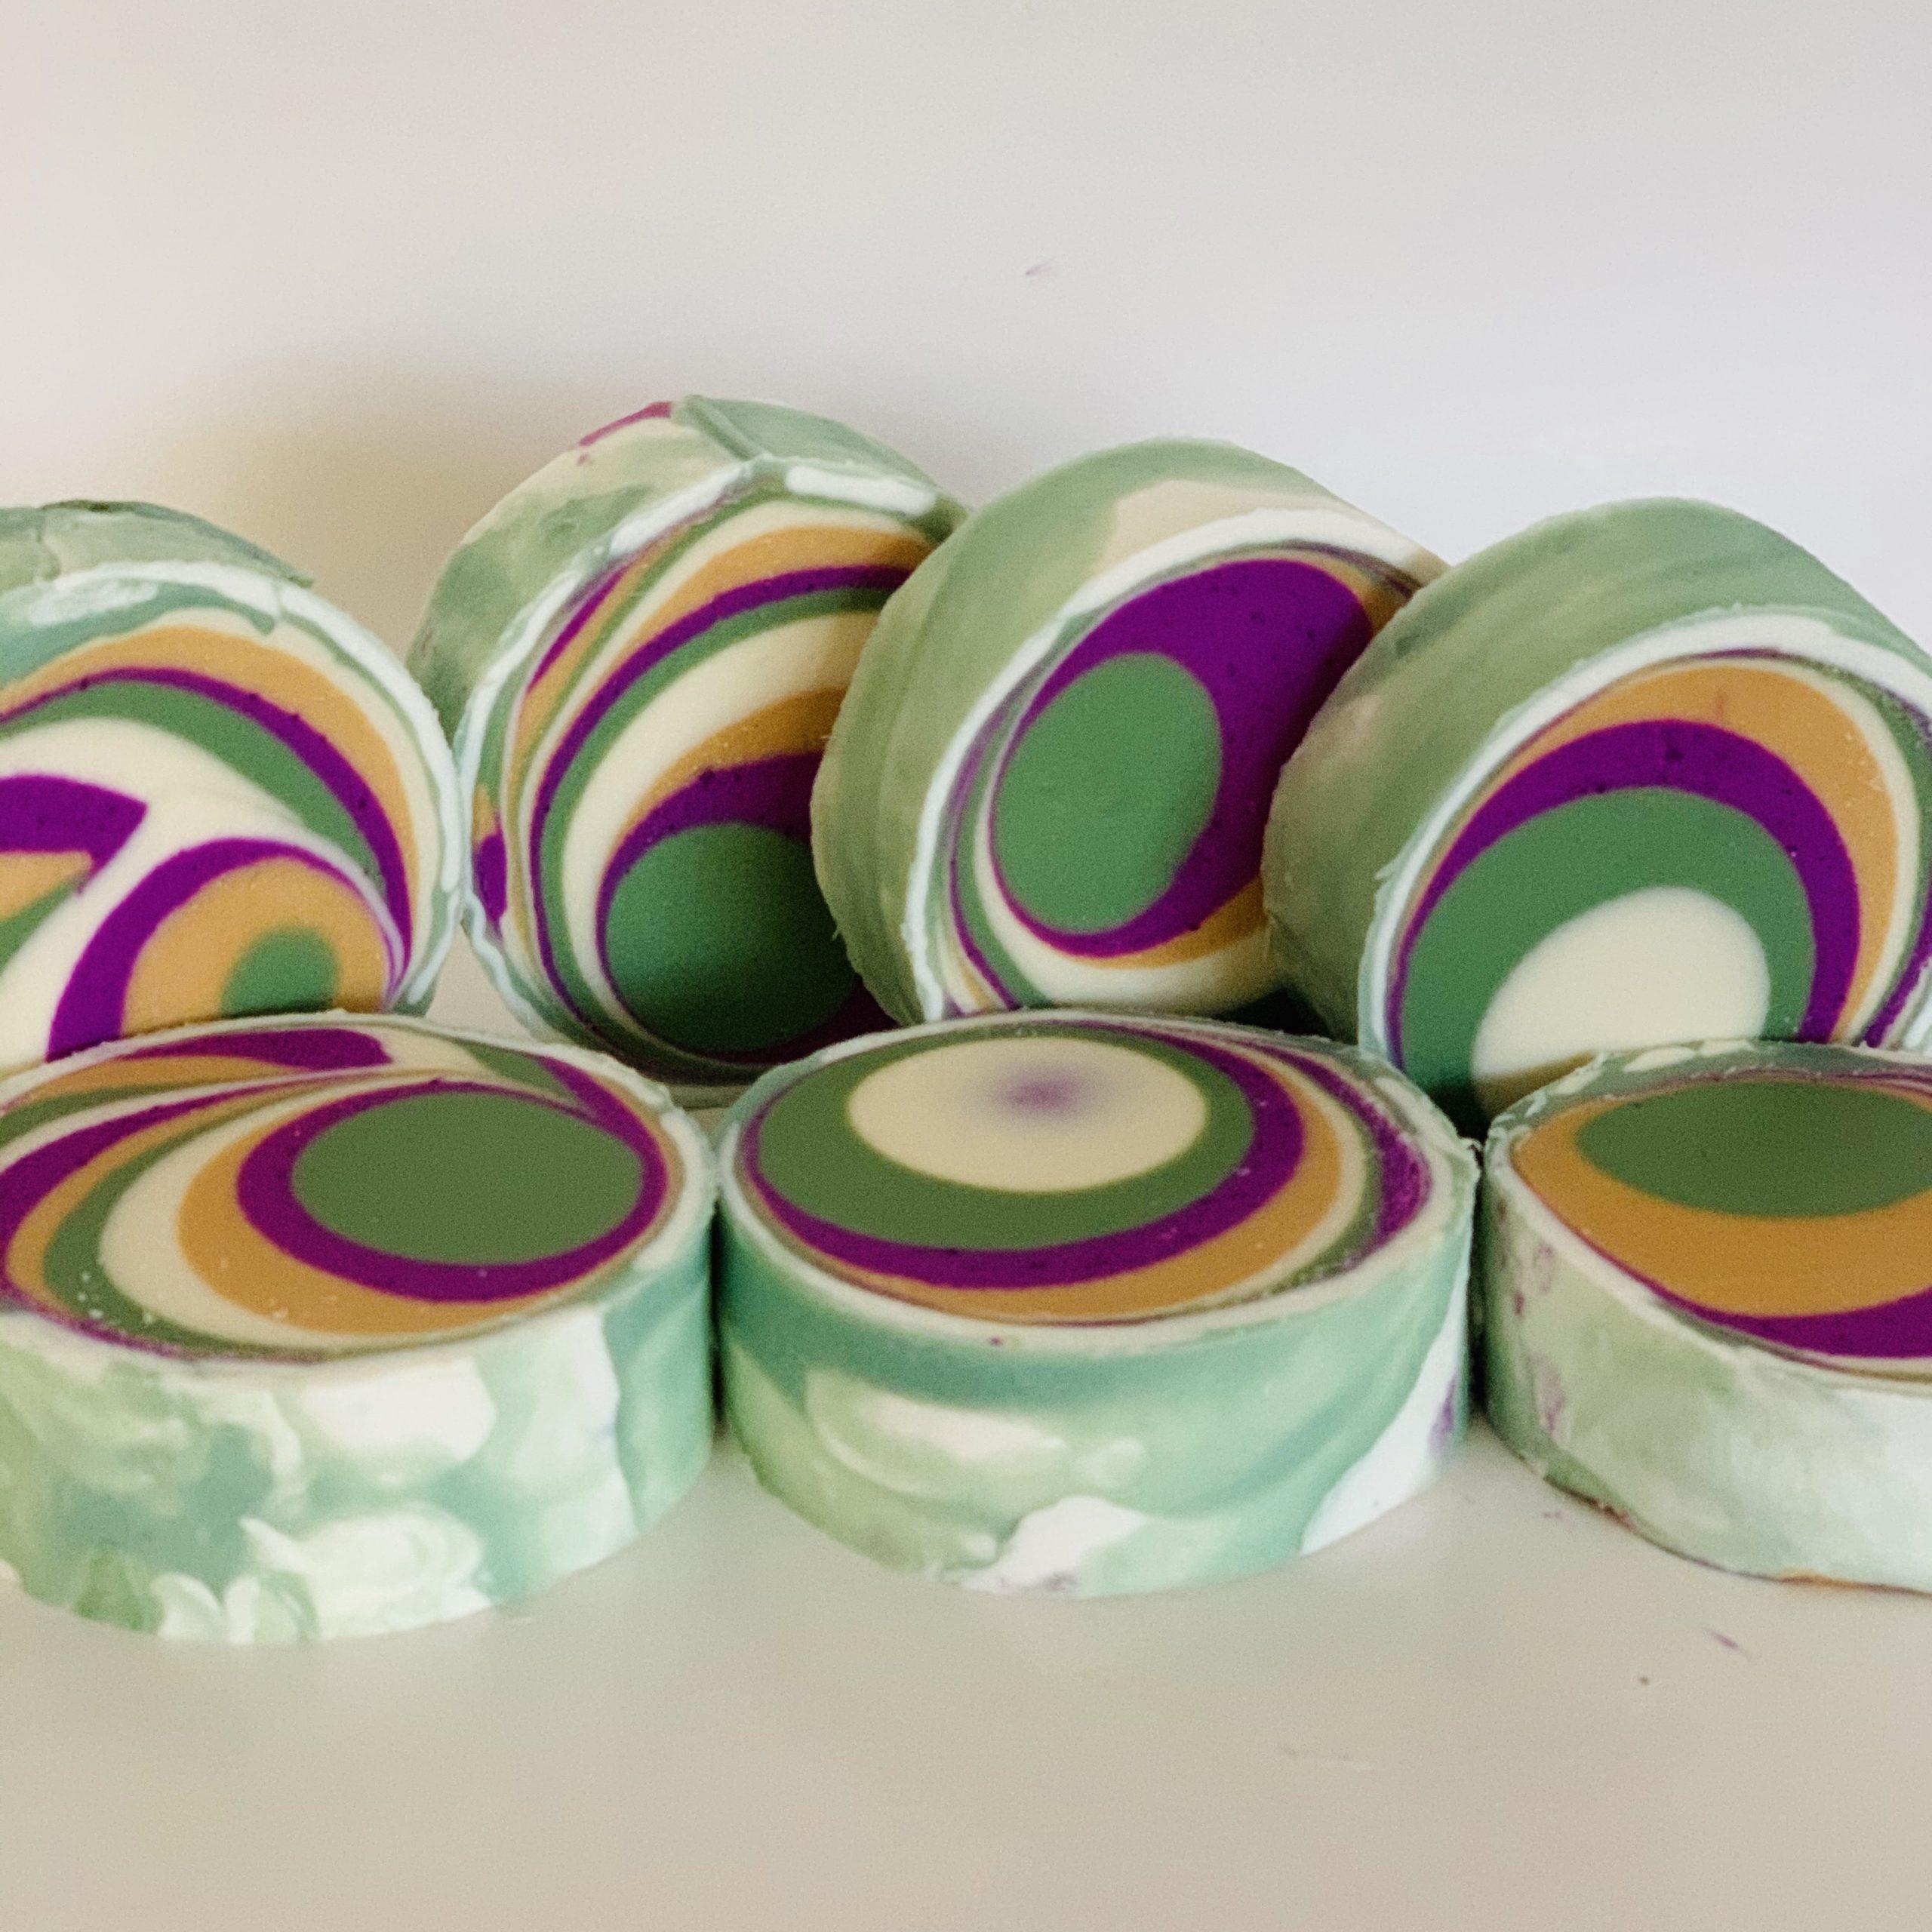 grape ape swirl soap